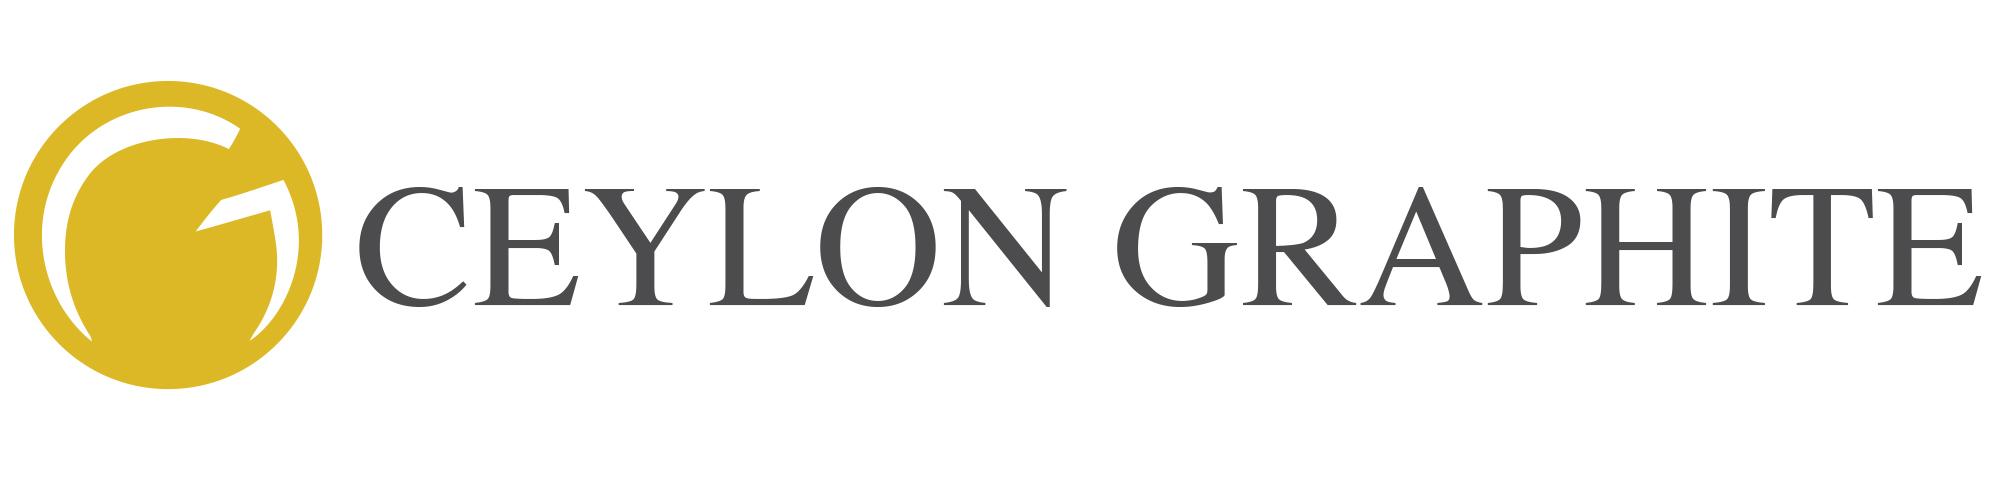 Ceylon Graphite Announces Proposed Private Placement of Units